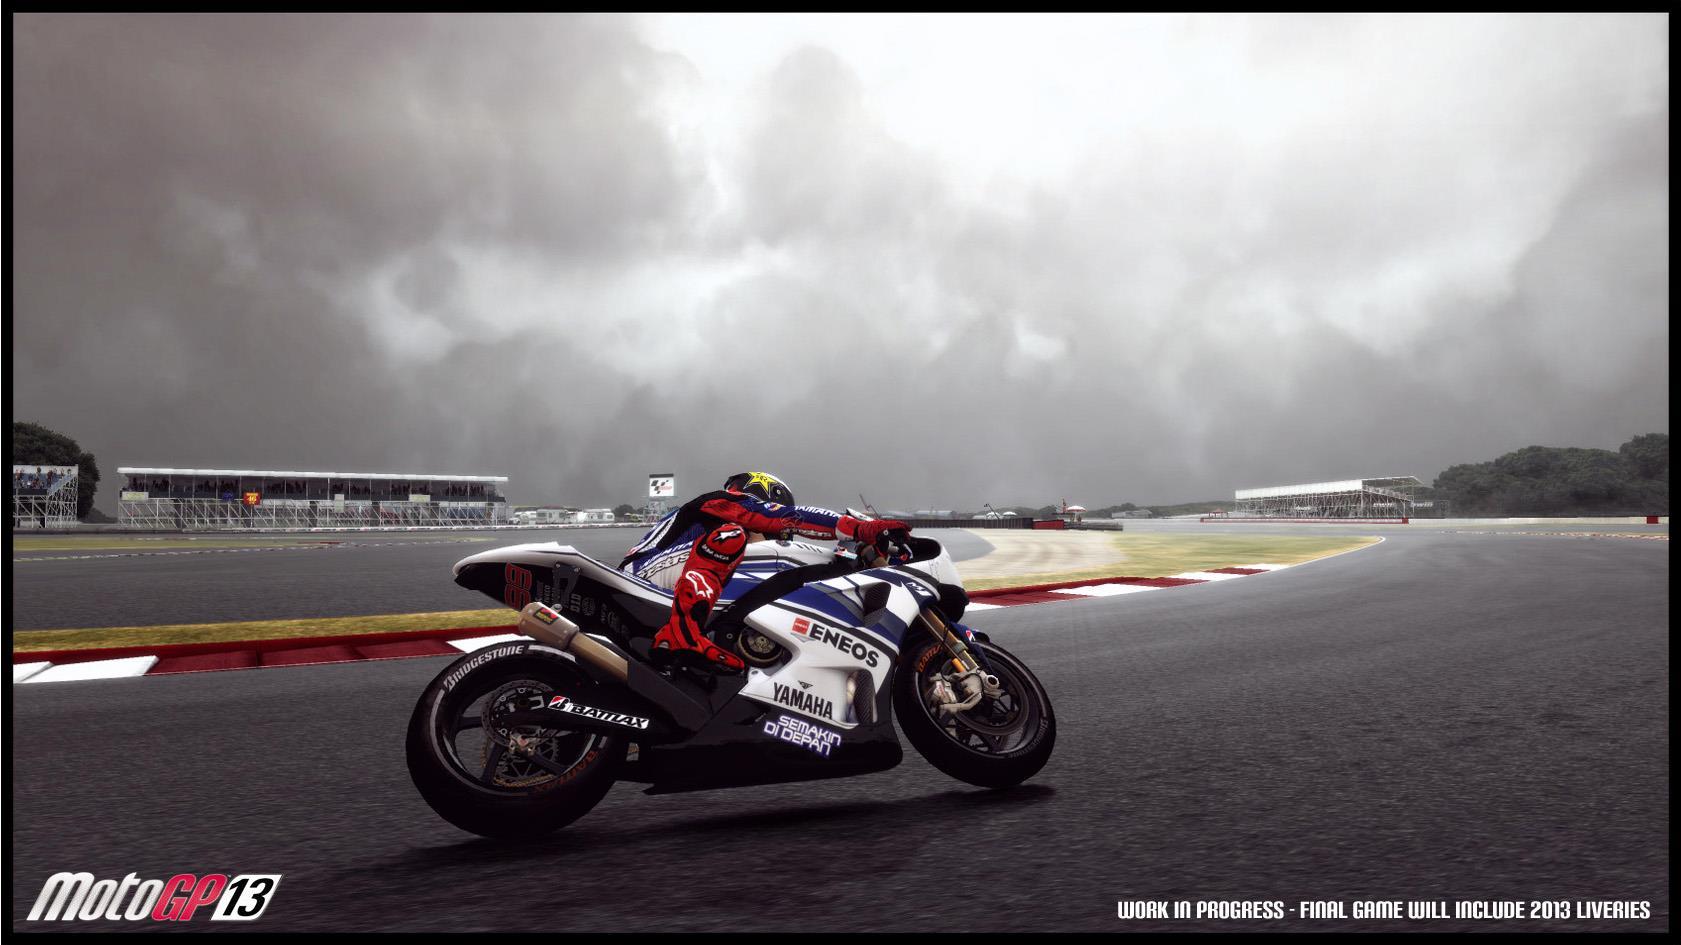 MotoGP '13 Silverstone screenshots showcase dynamic weather